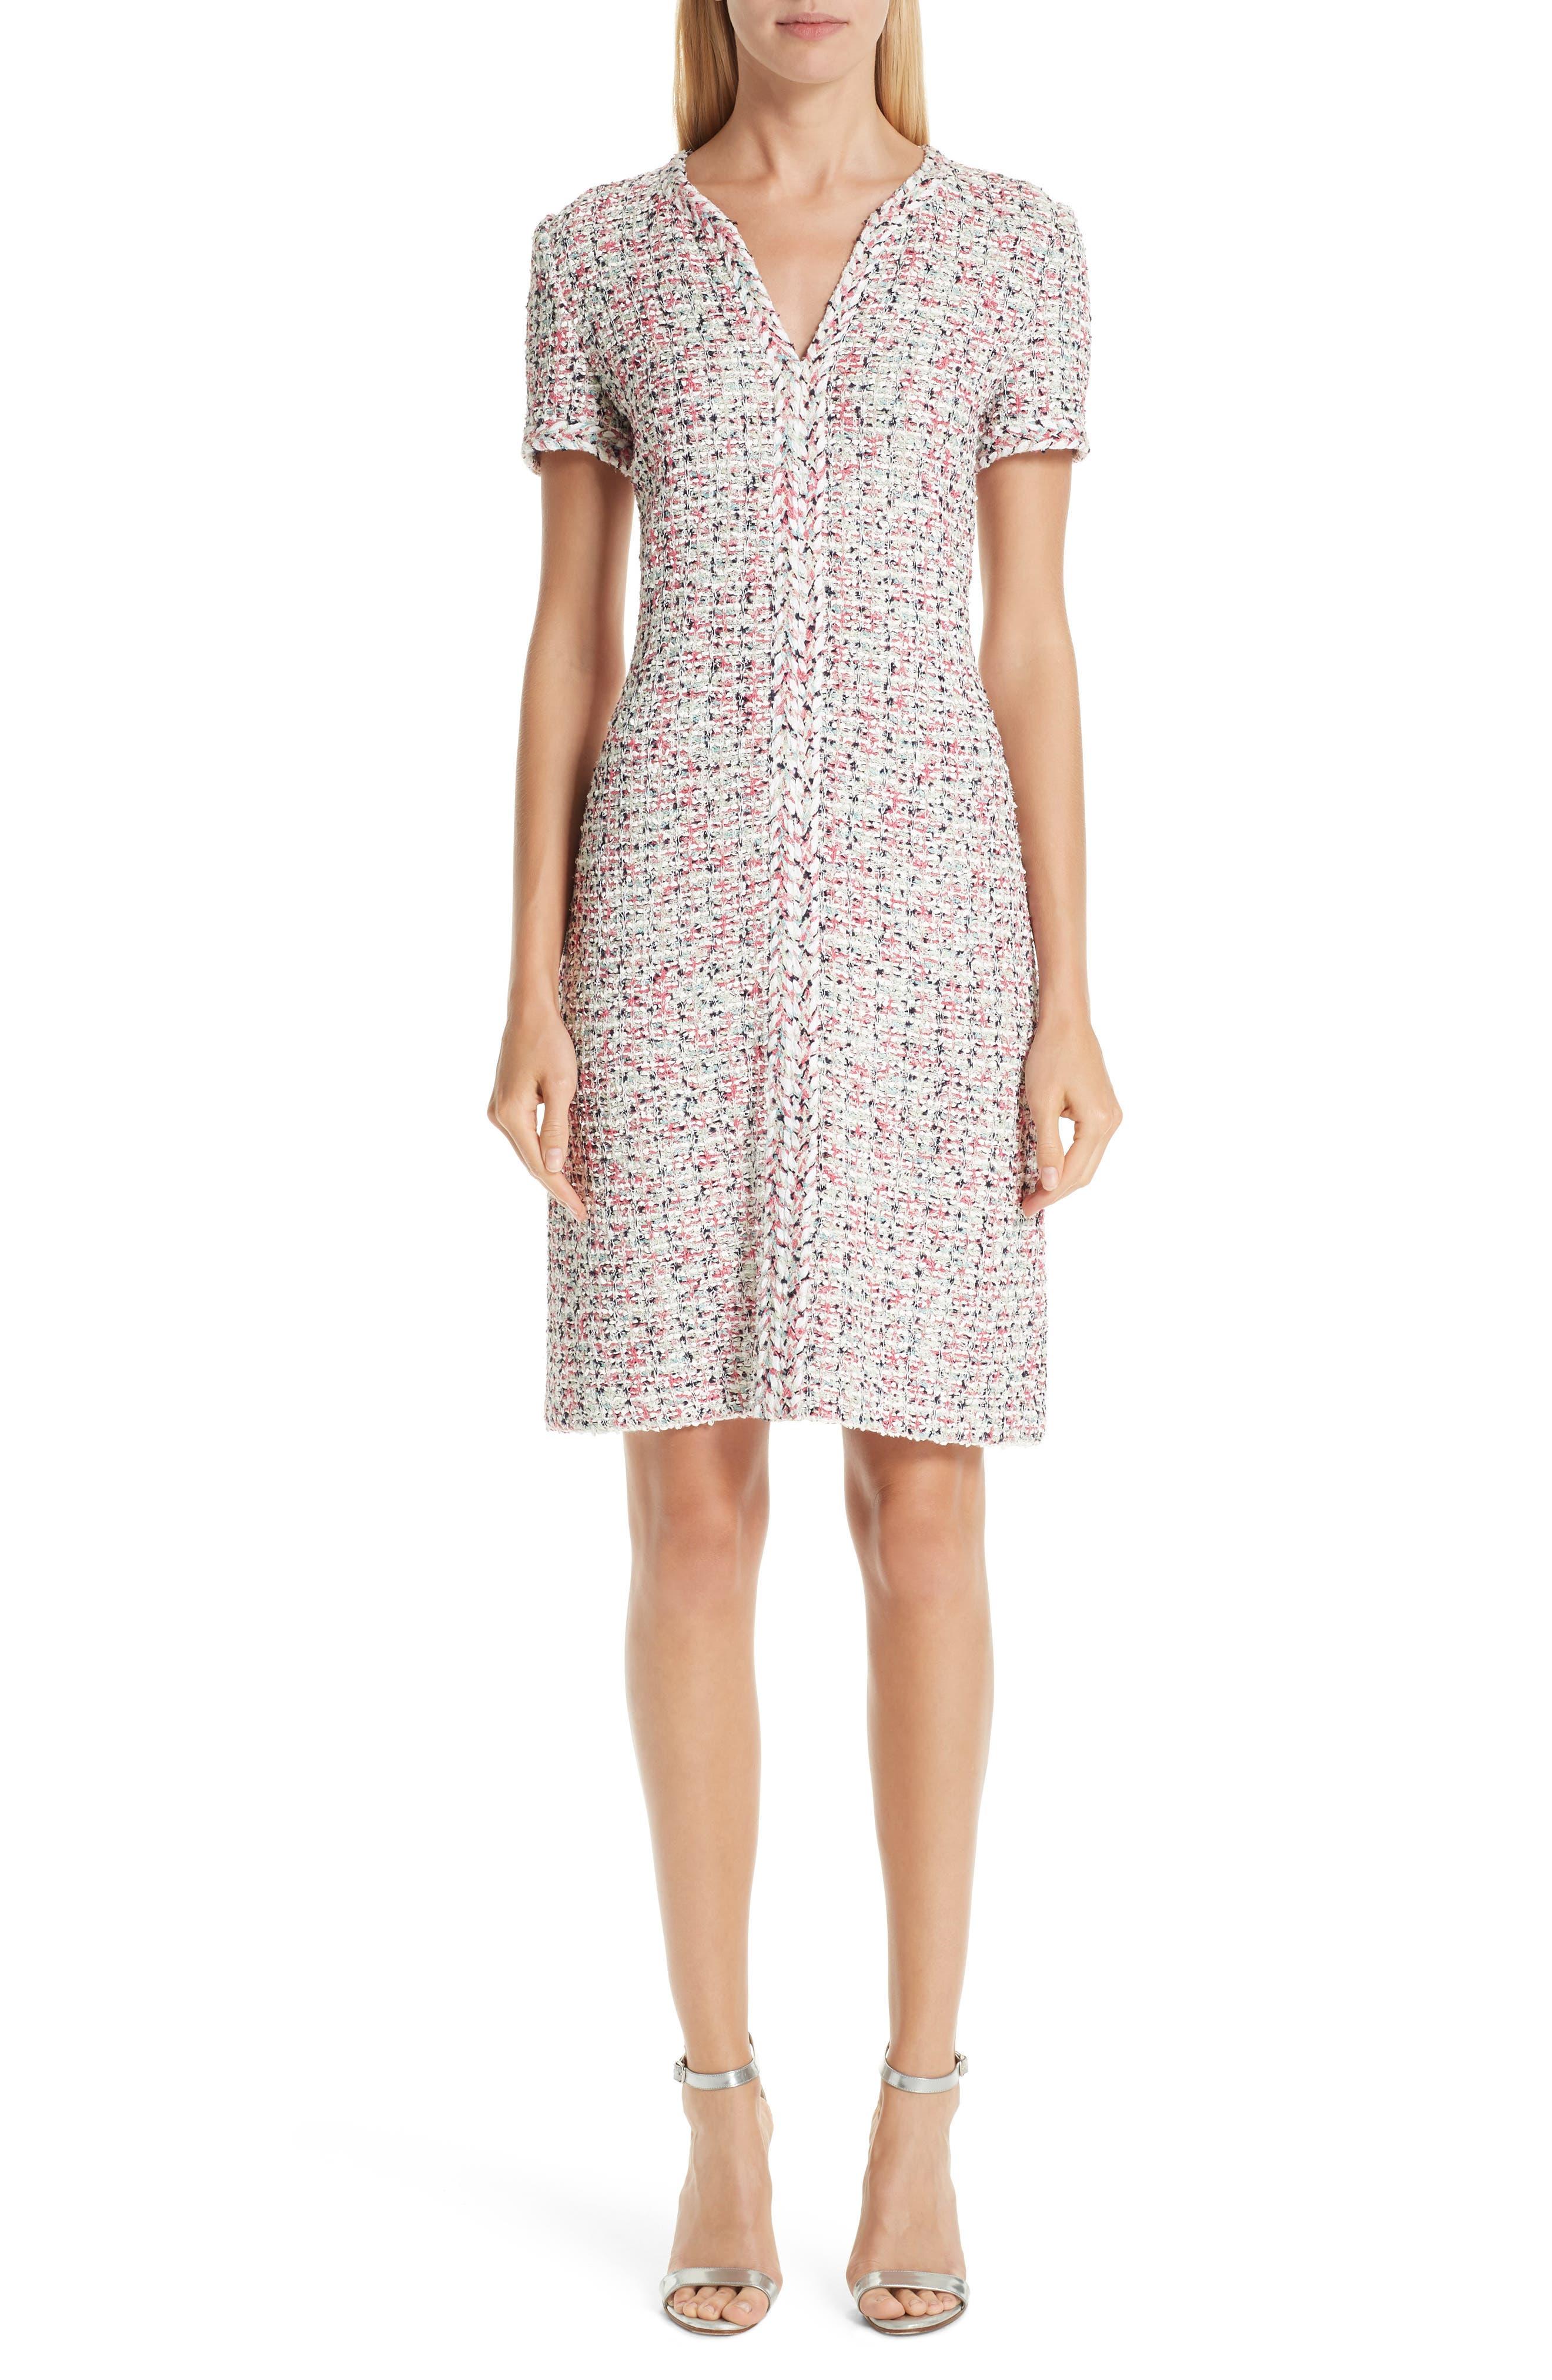 ST. JOHN COLLECTION Modern Knit Dress, Main, color, CREAM MULTI